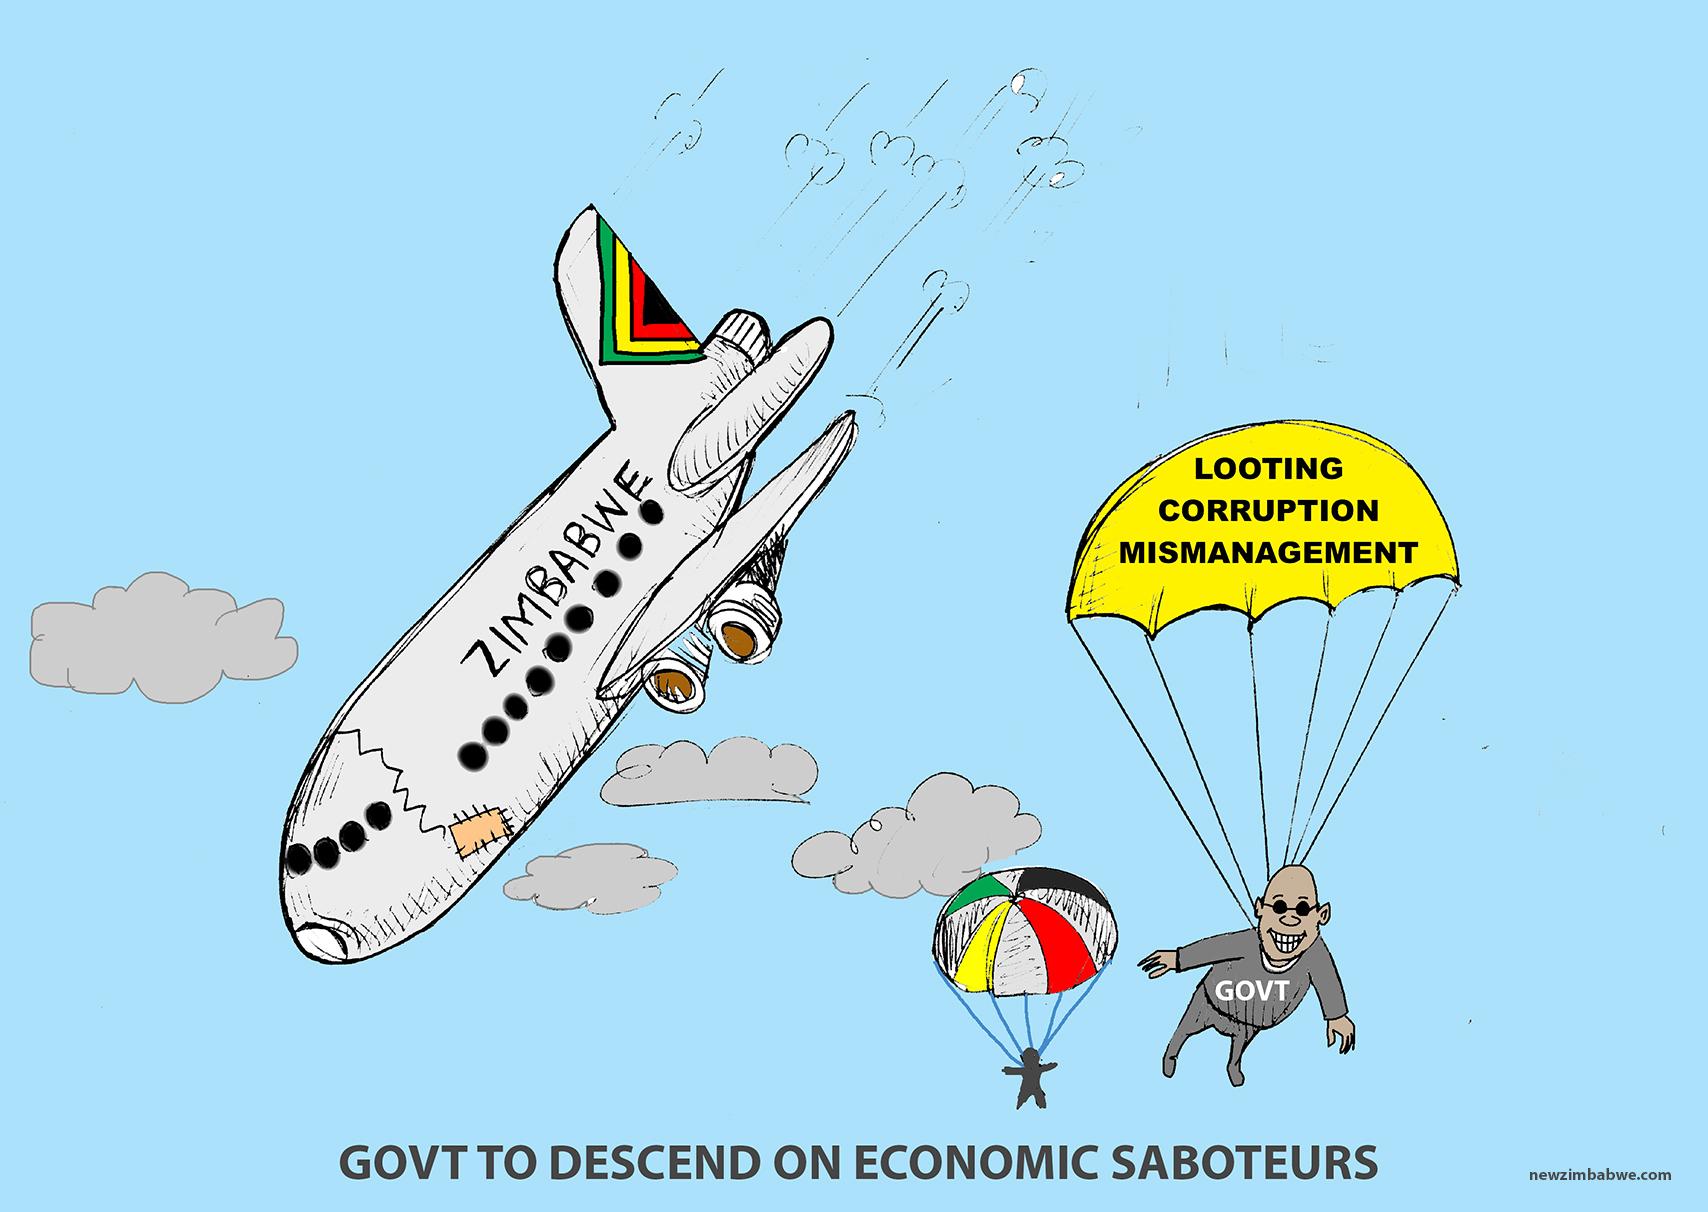 Govt to descend on economic saboteurs